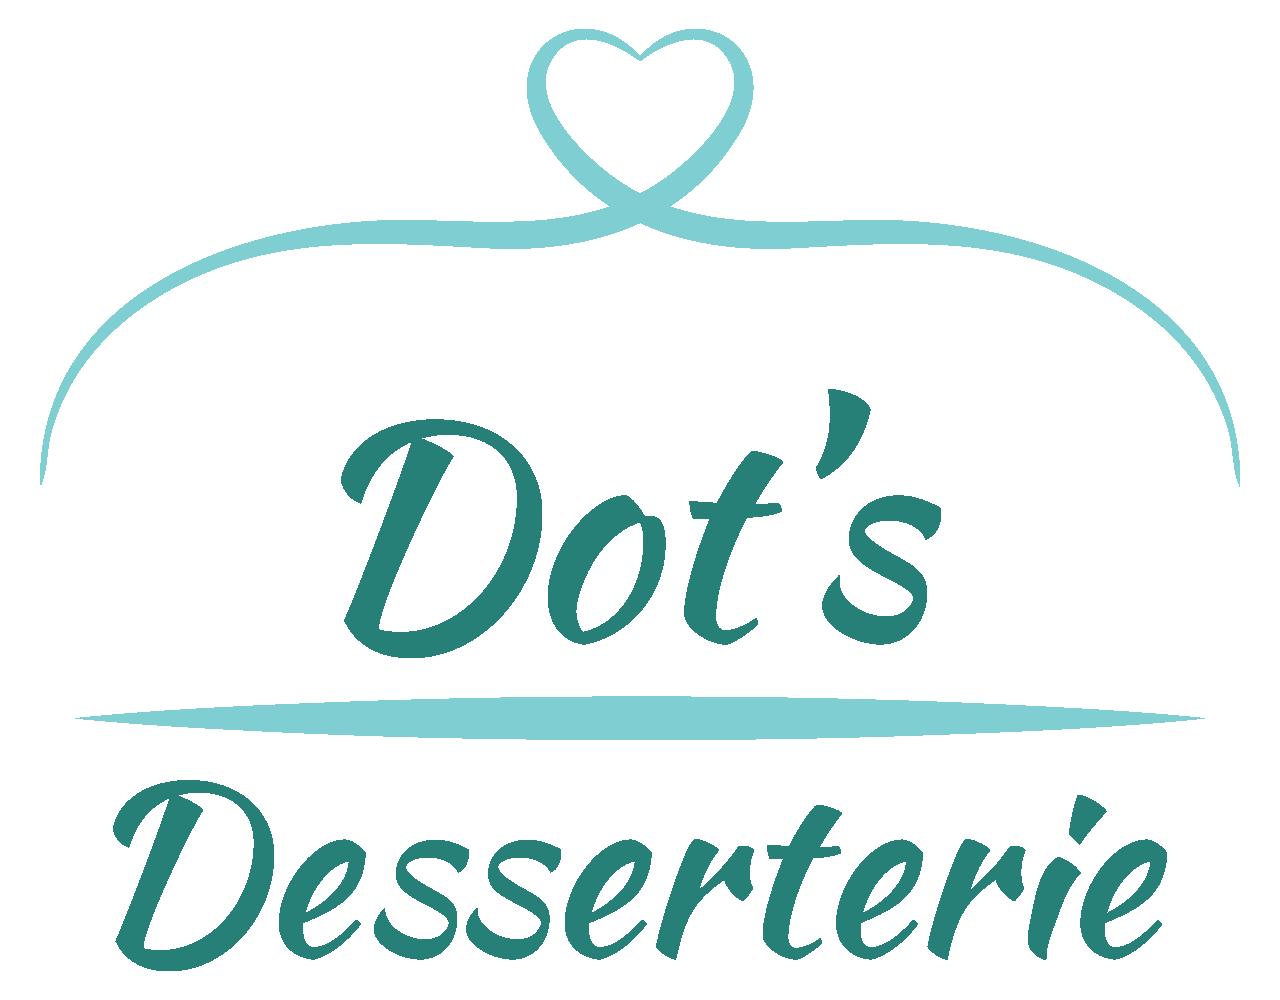 dots-desserteries-logo